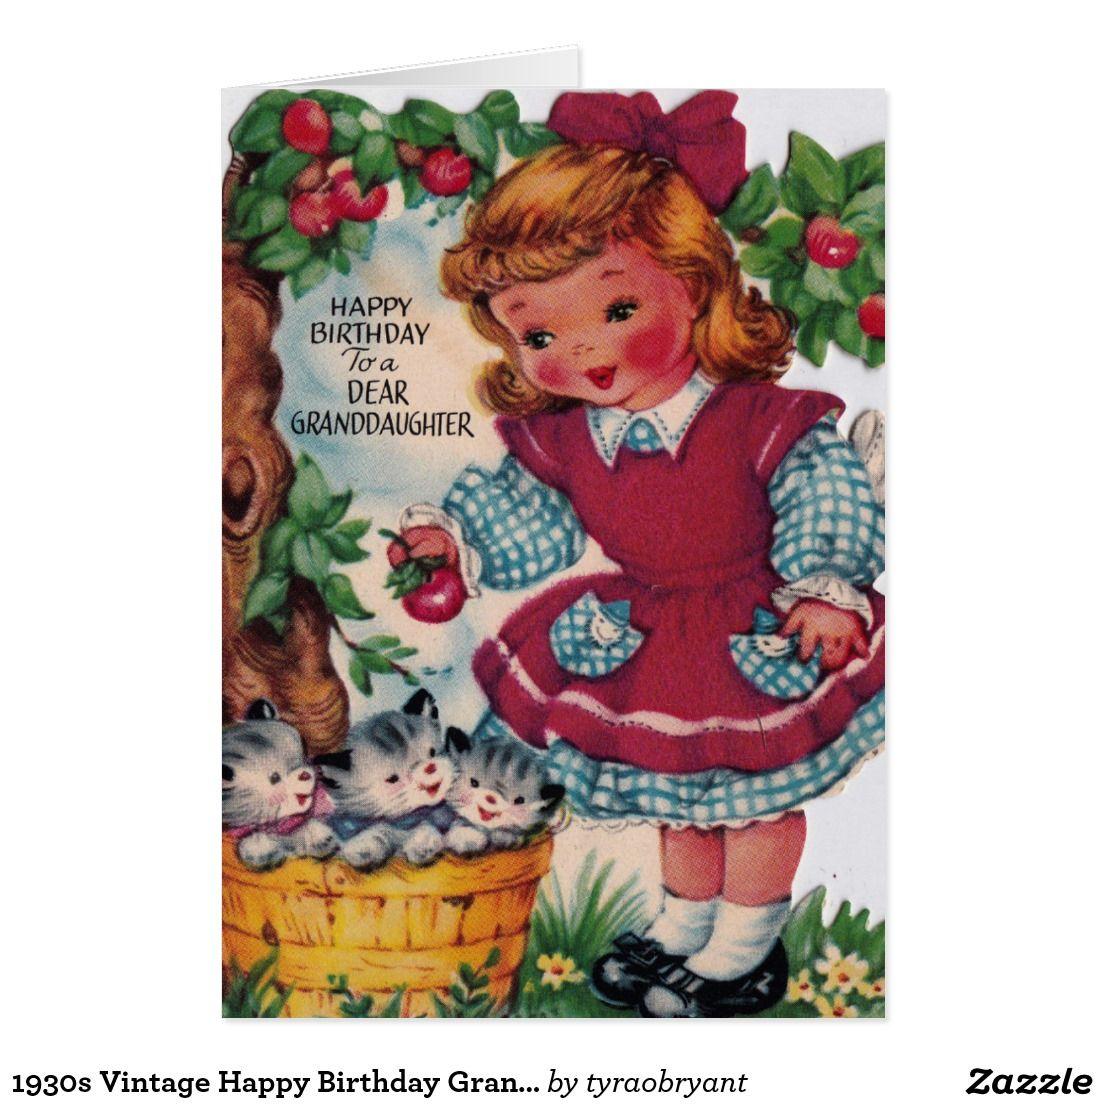 1930s Vintage Happy Birthday Granddaughter Card Zazzle